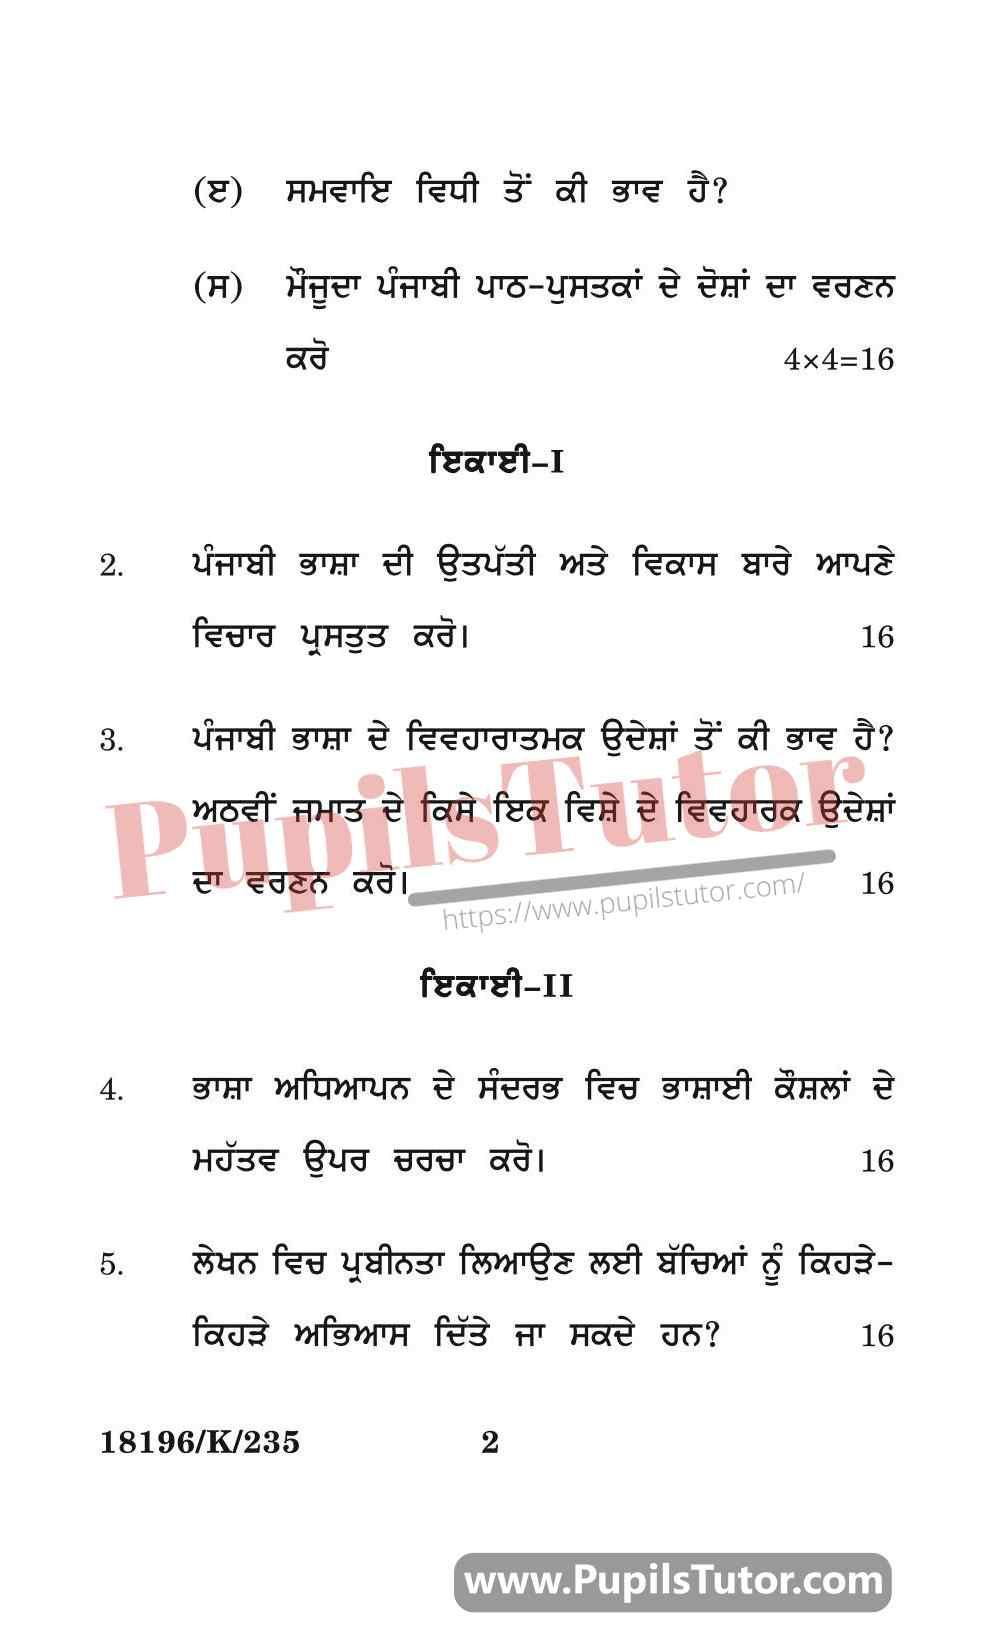 KUK (Kurukshetra University, Haryana) Pedagogy Of Punjabi Question Paper 2020 For B.Ed 1st And 2nd Year And All The 4 Semesters Free Download PDF - Page 2 - www.pupilstutor.com